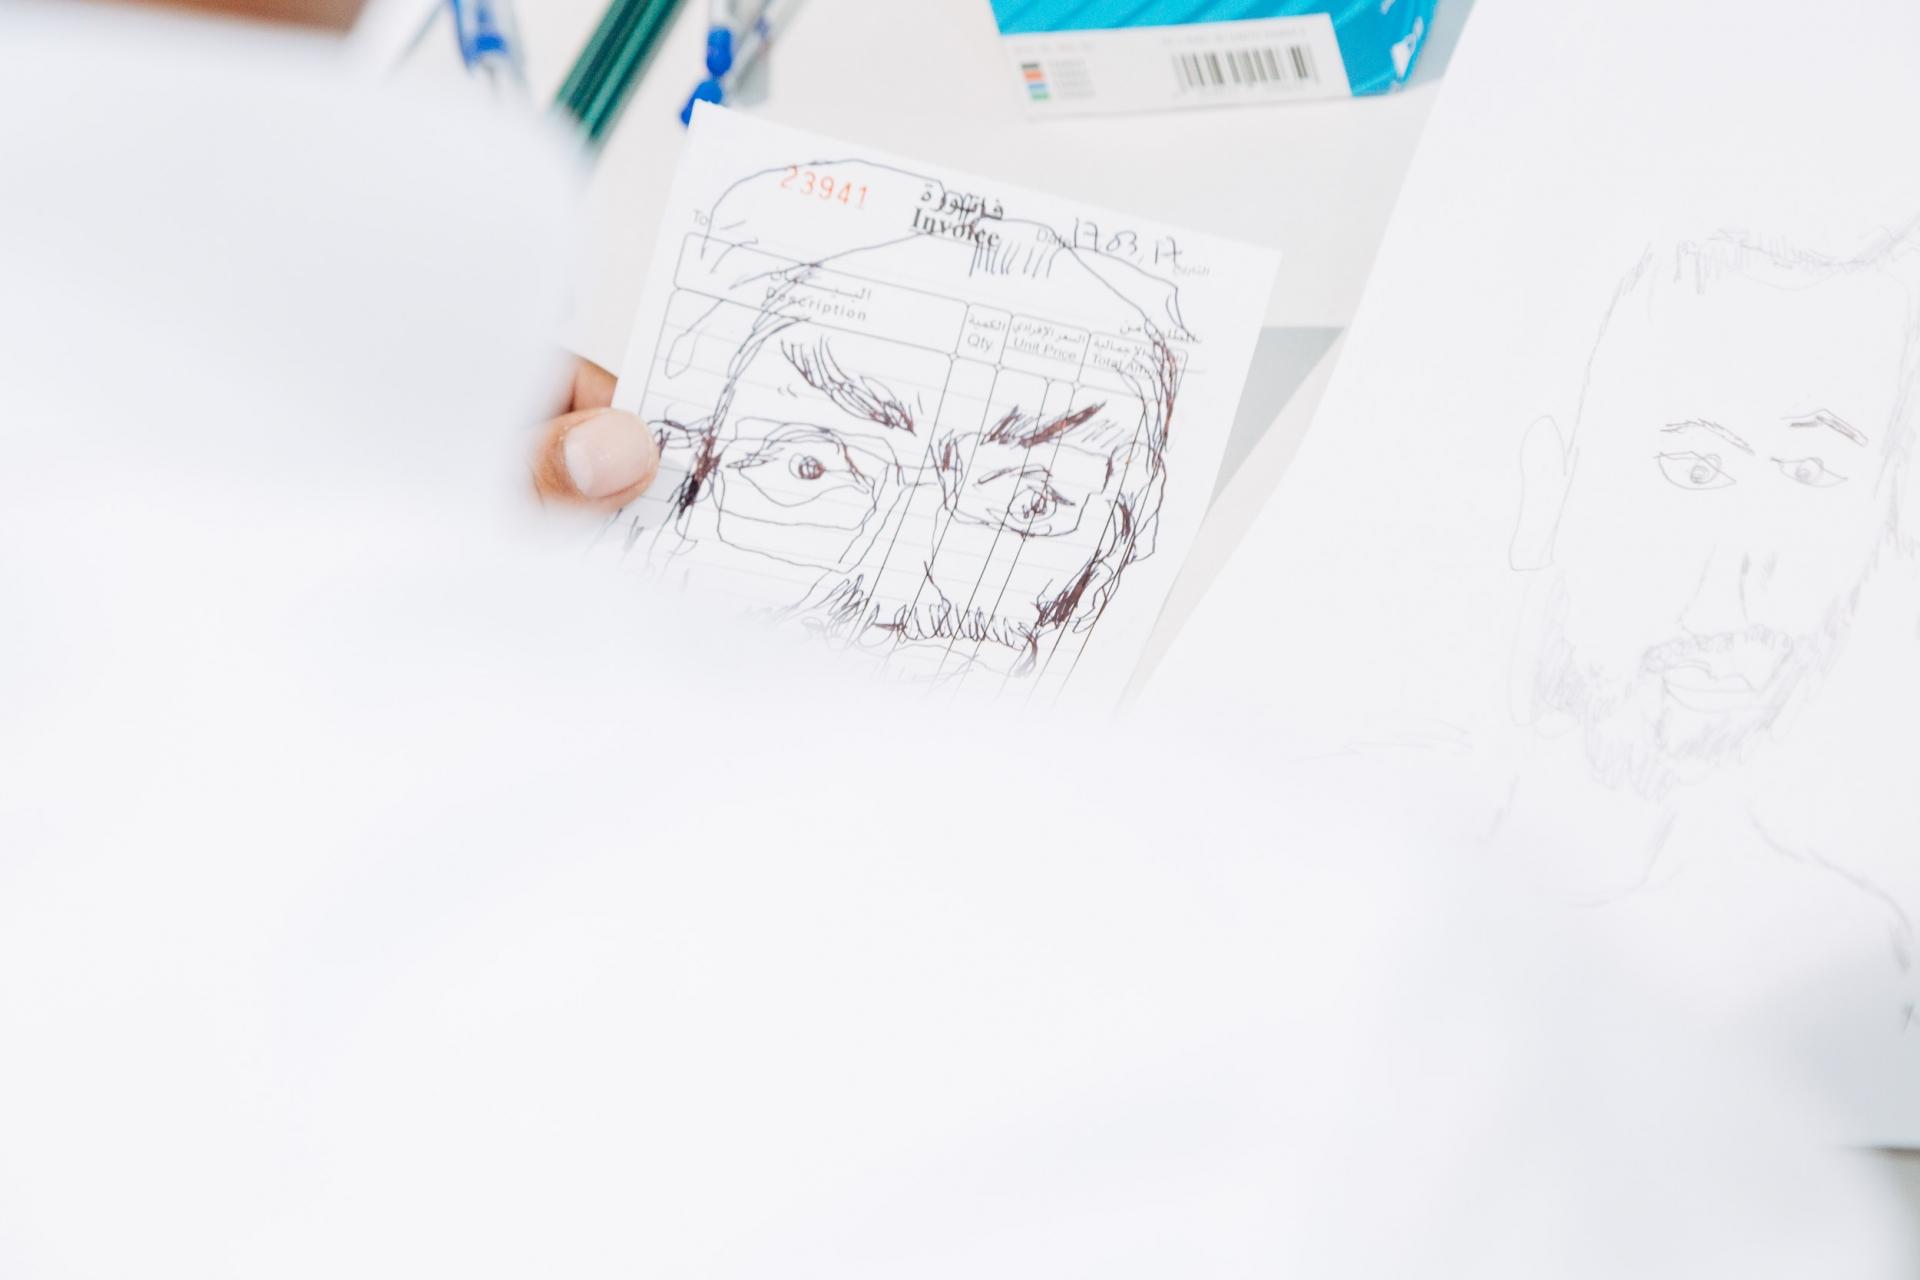 Helga Traxler FULLY BOOKED ARTDUBAI 2017/18/19